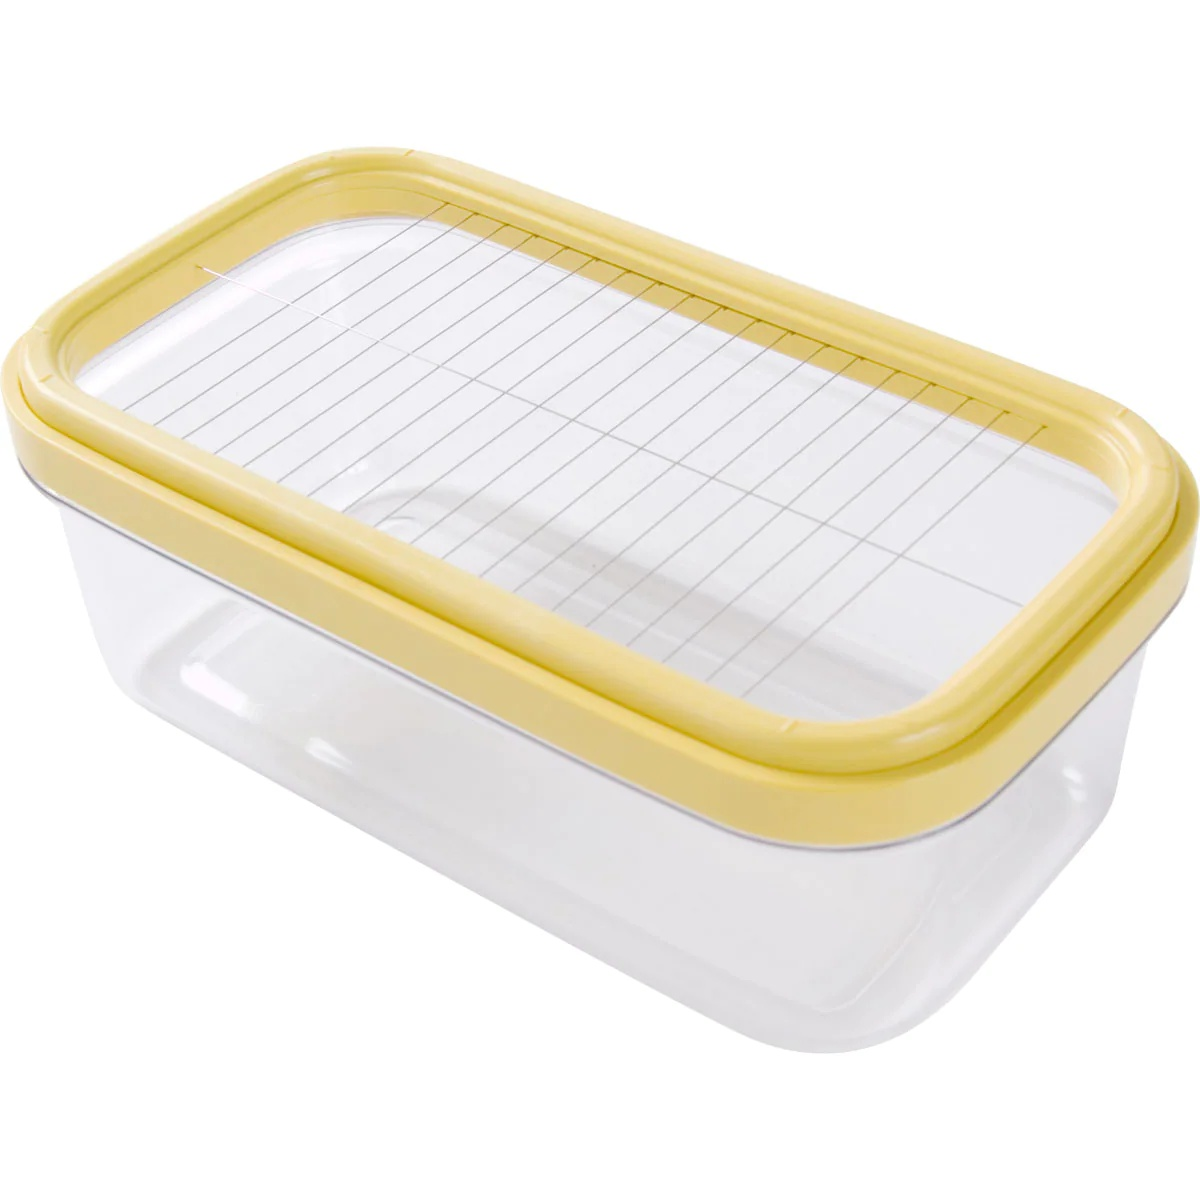 NITORI(ニトリ) バターケースの商品画像10